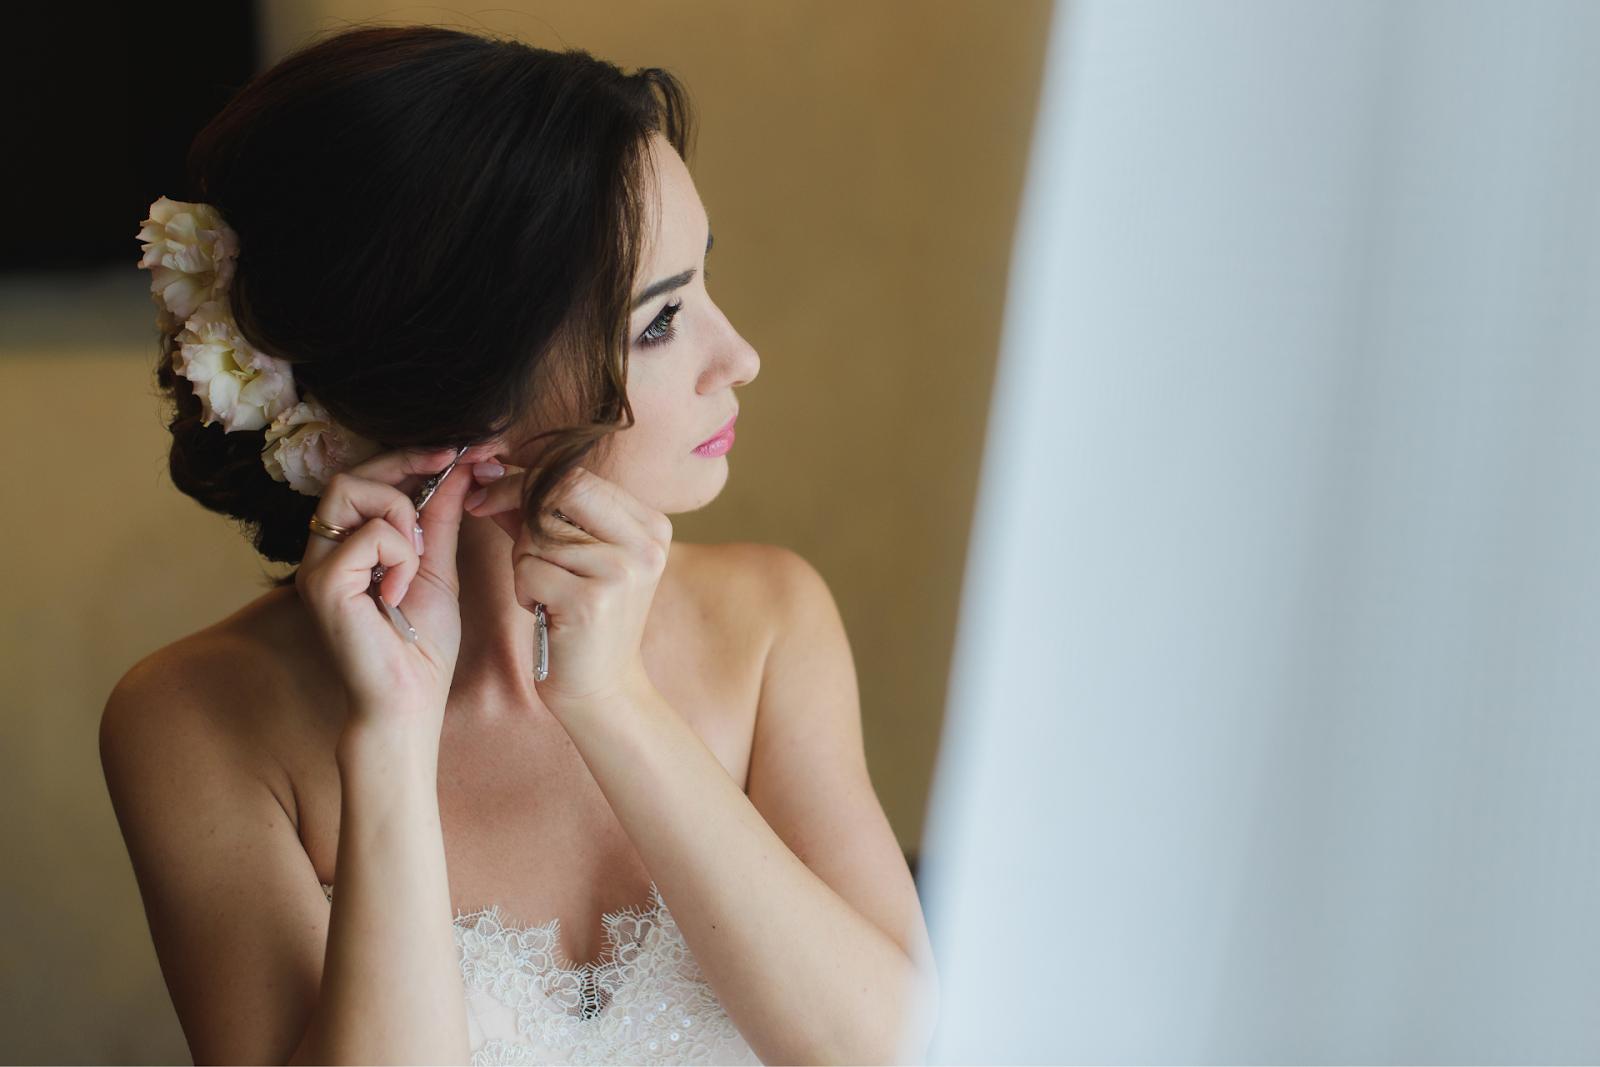 Bride in white wedding dress puts on earring